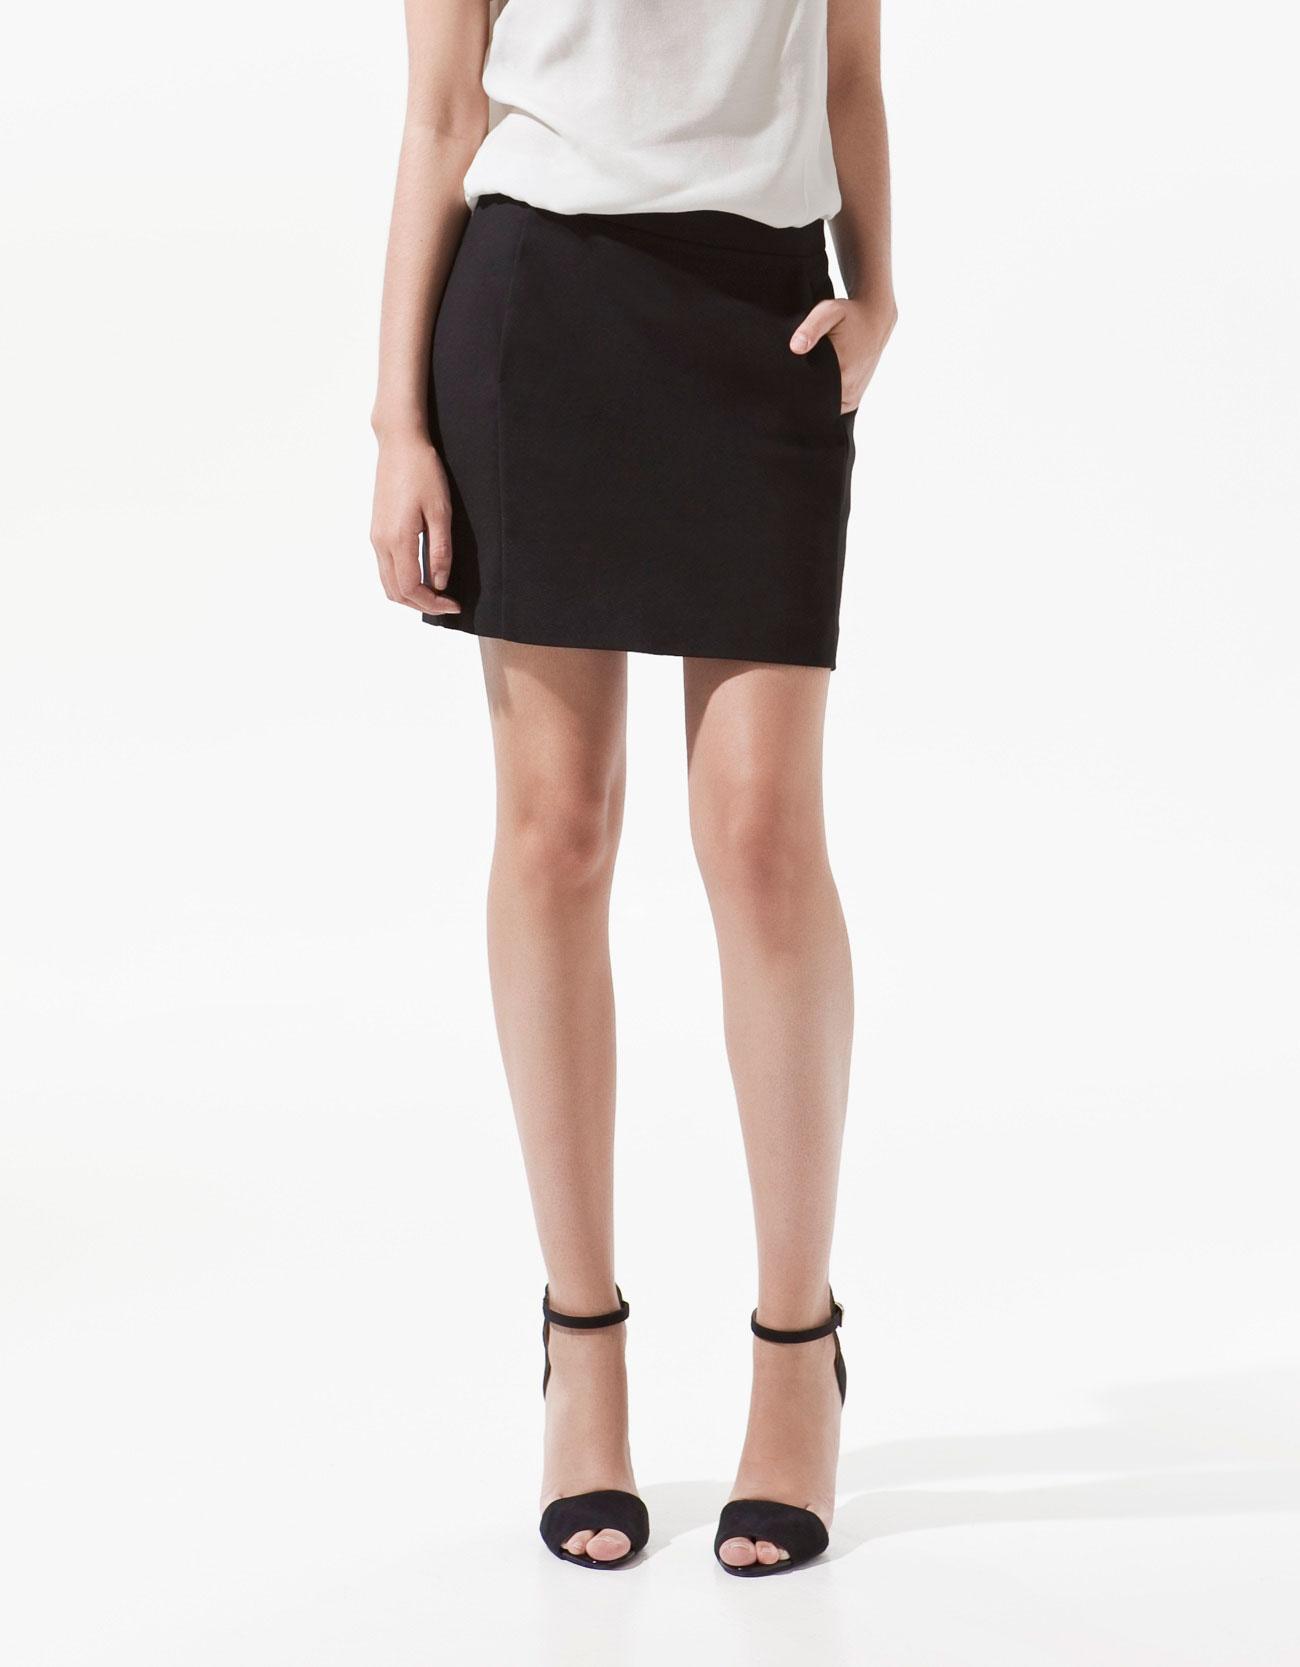 Zara Mini Skirt in Black | Lyst